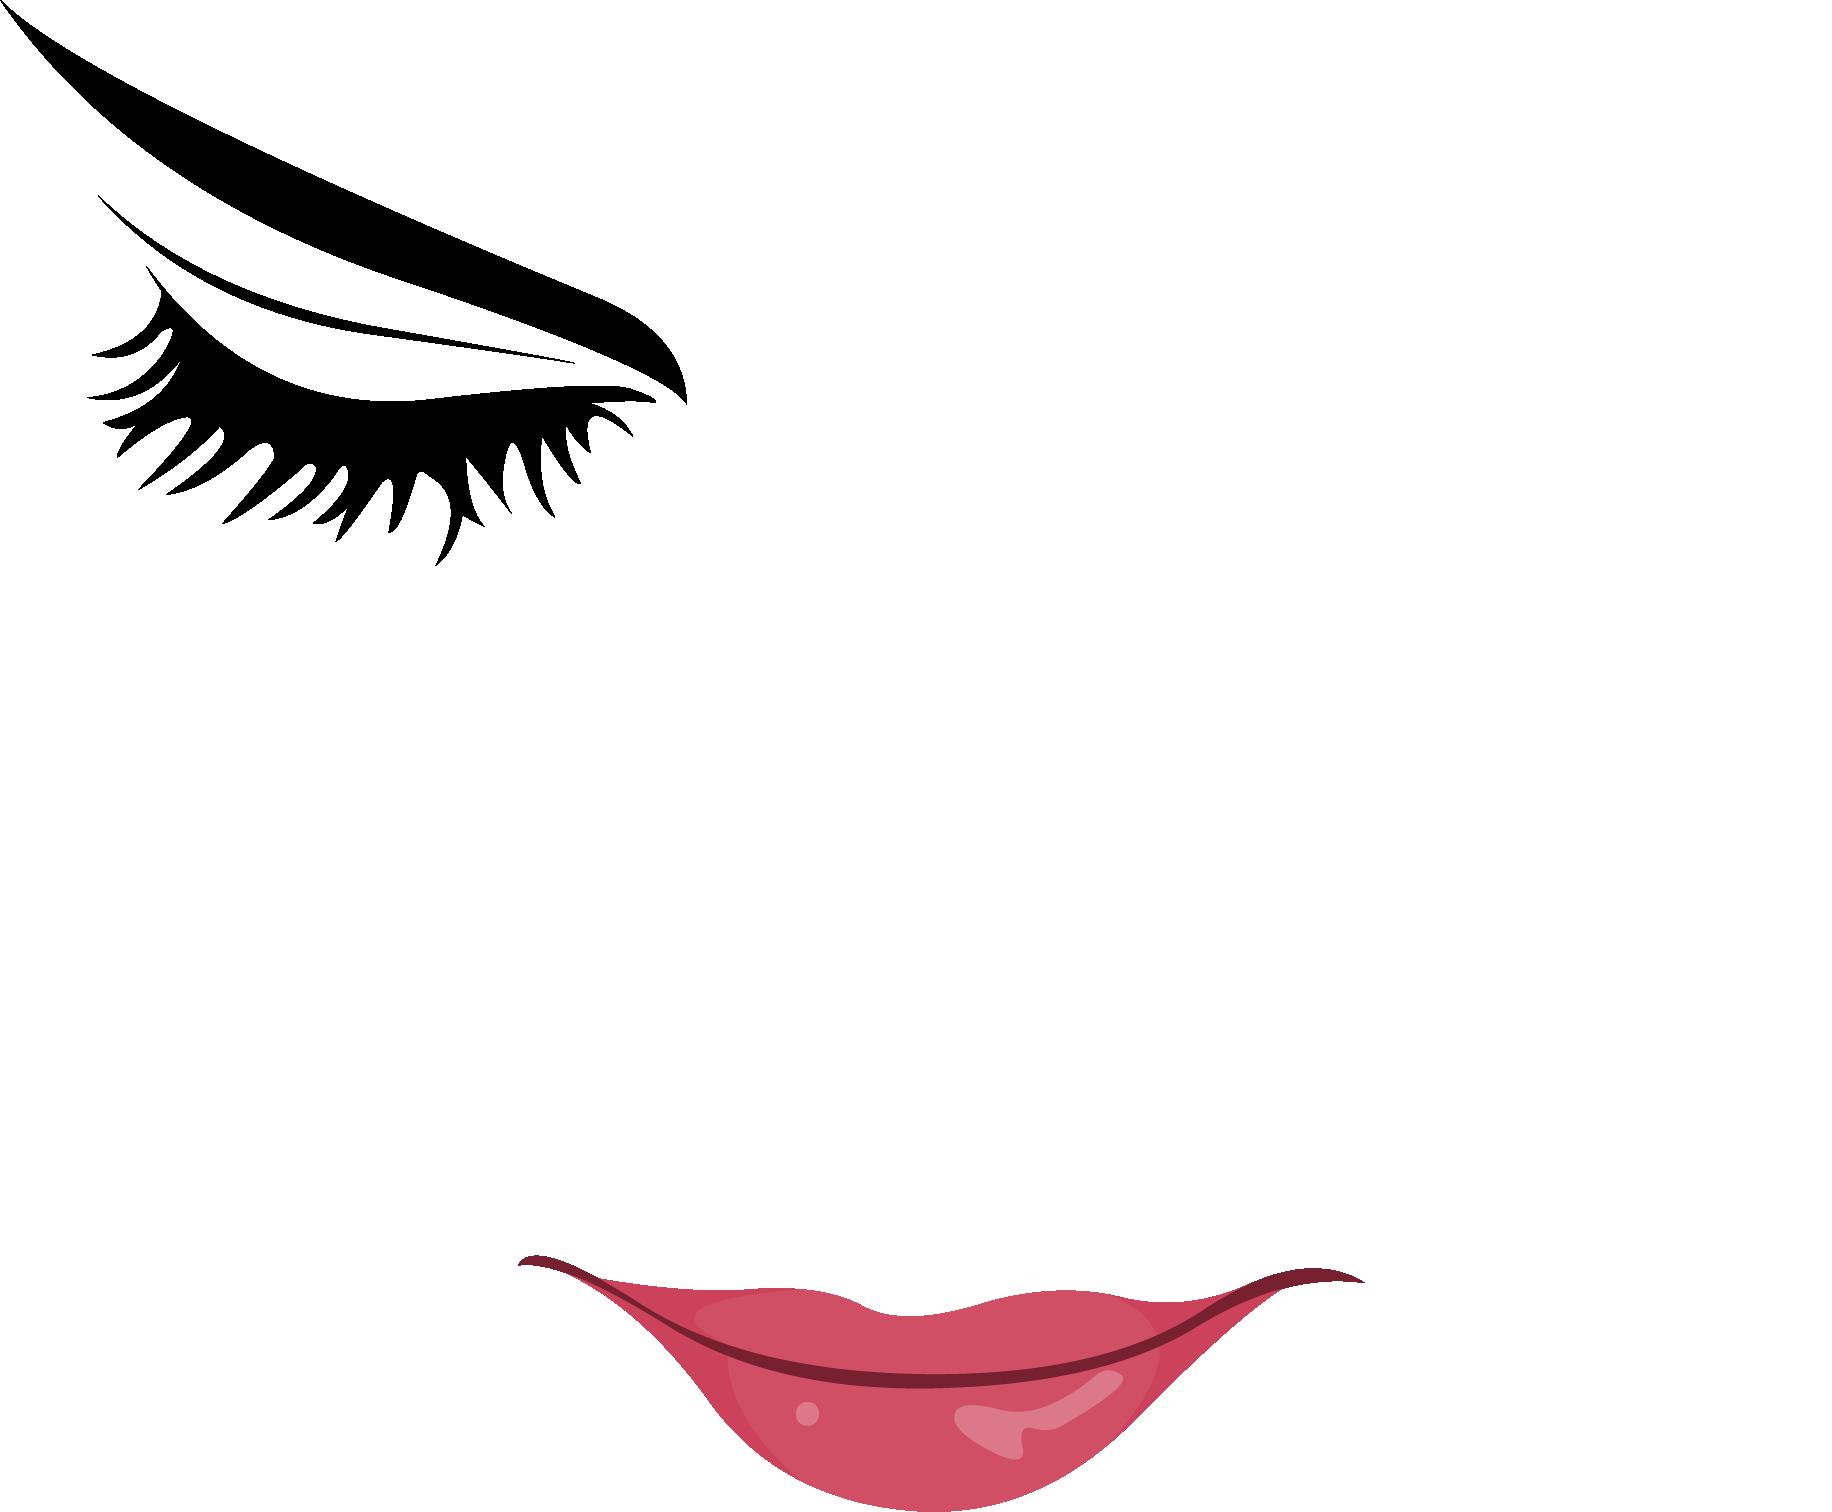 Eyelash clipart nose, Eyelash nose Transparent FREE for.